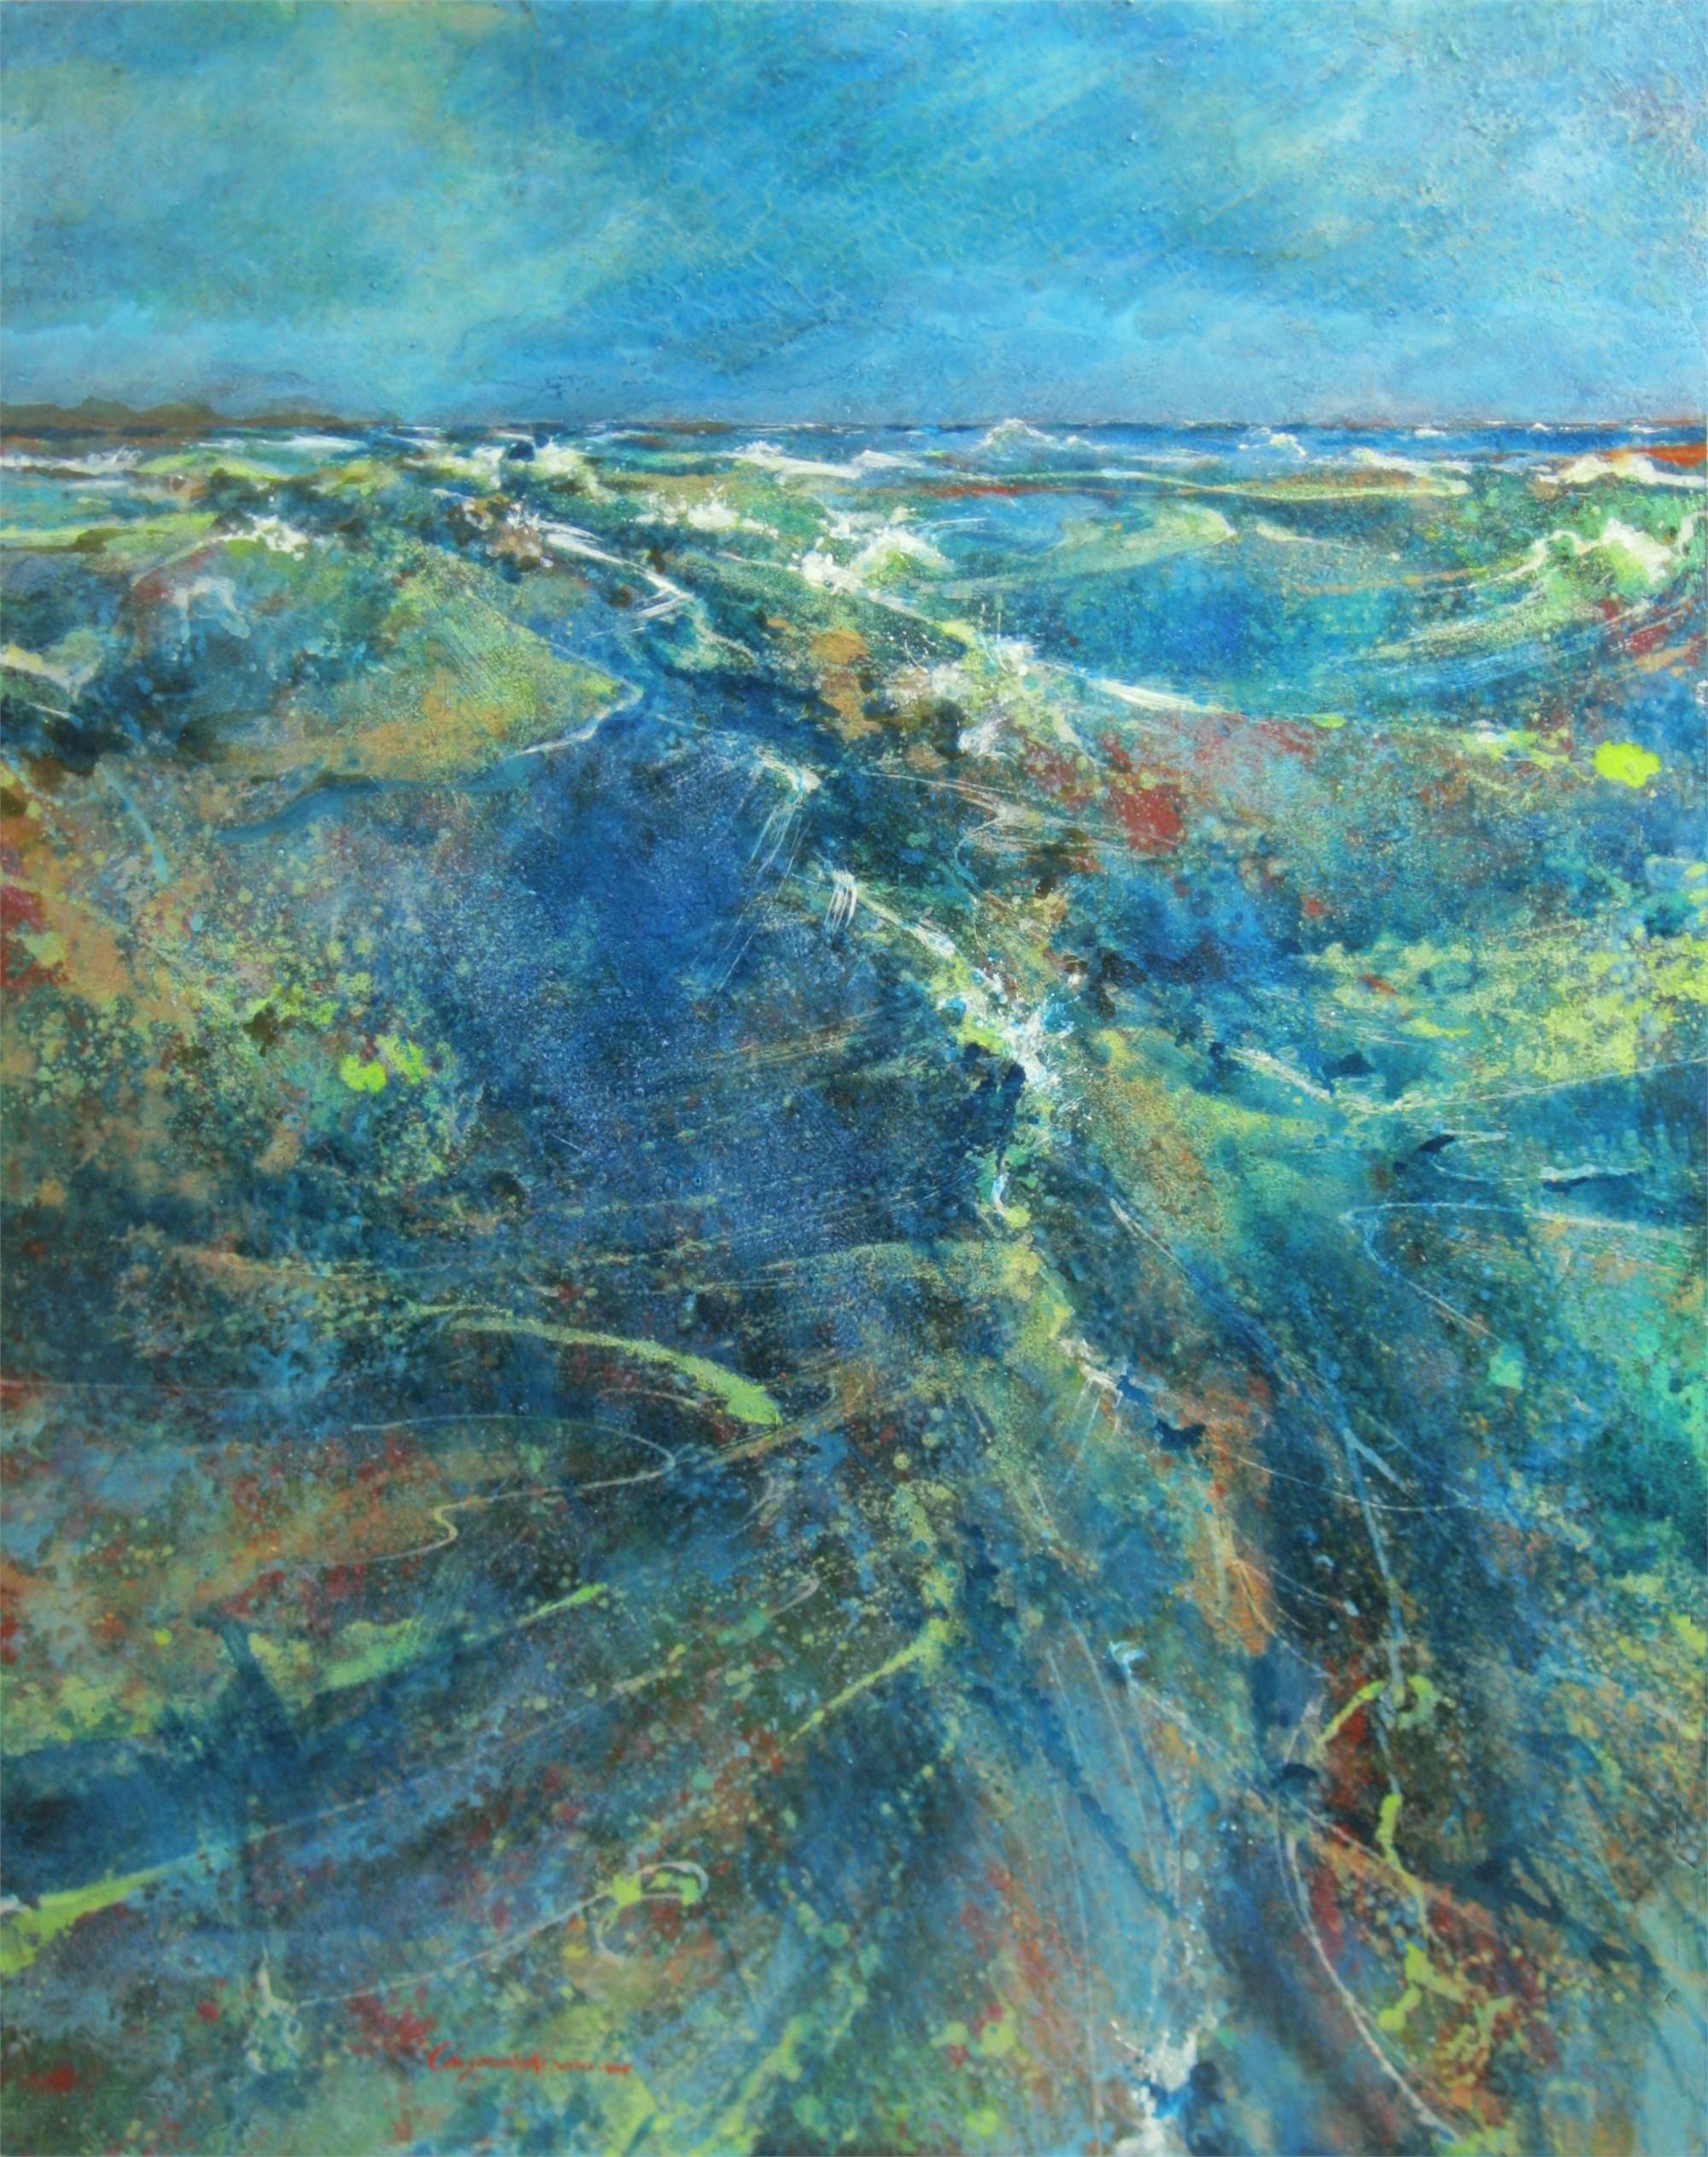 Painted Coast by Bob Chrzanowski